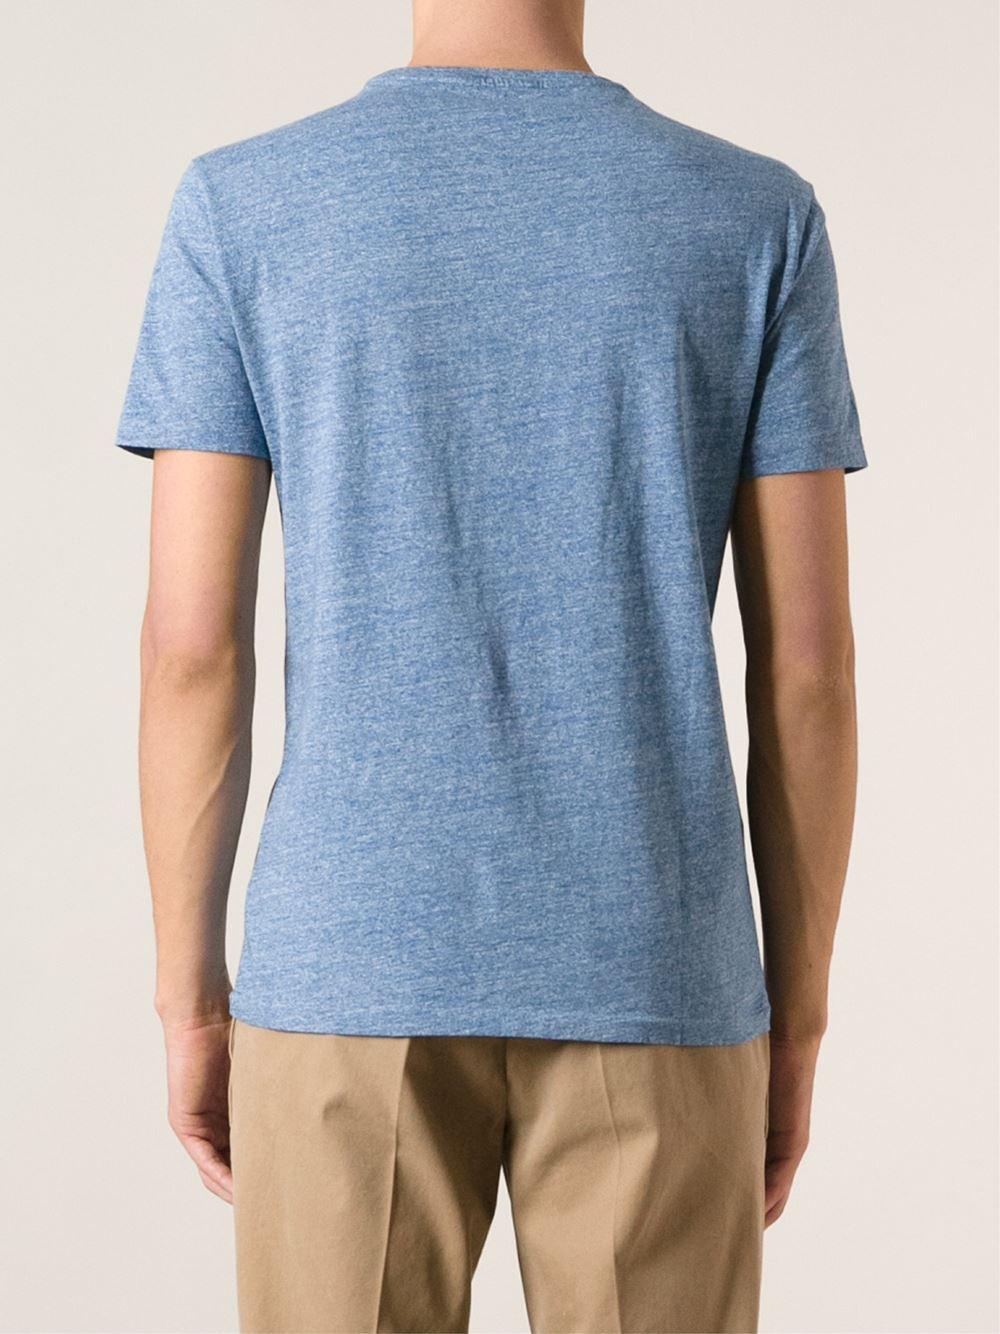 Polo ralph lauren custom fit t shirt in blue for men lyst for Polo custom fit t shirts